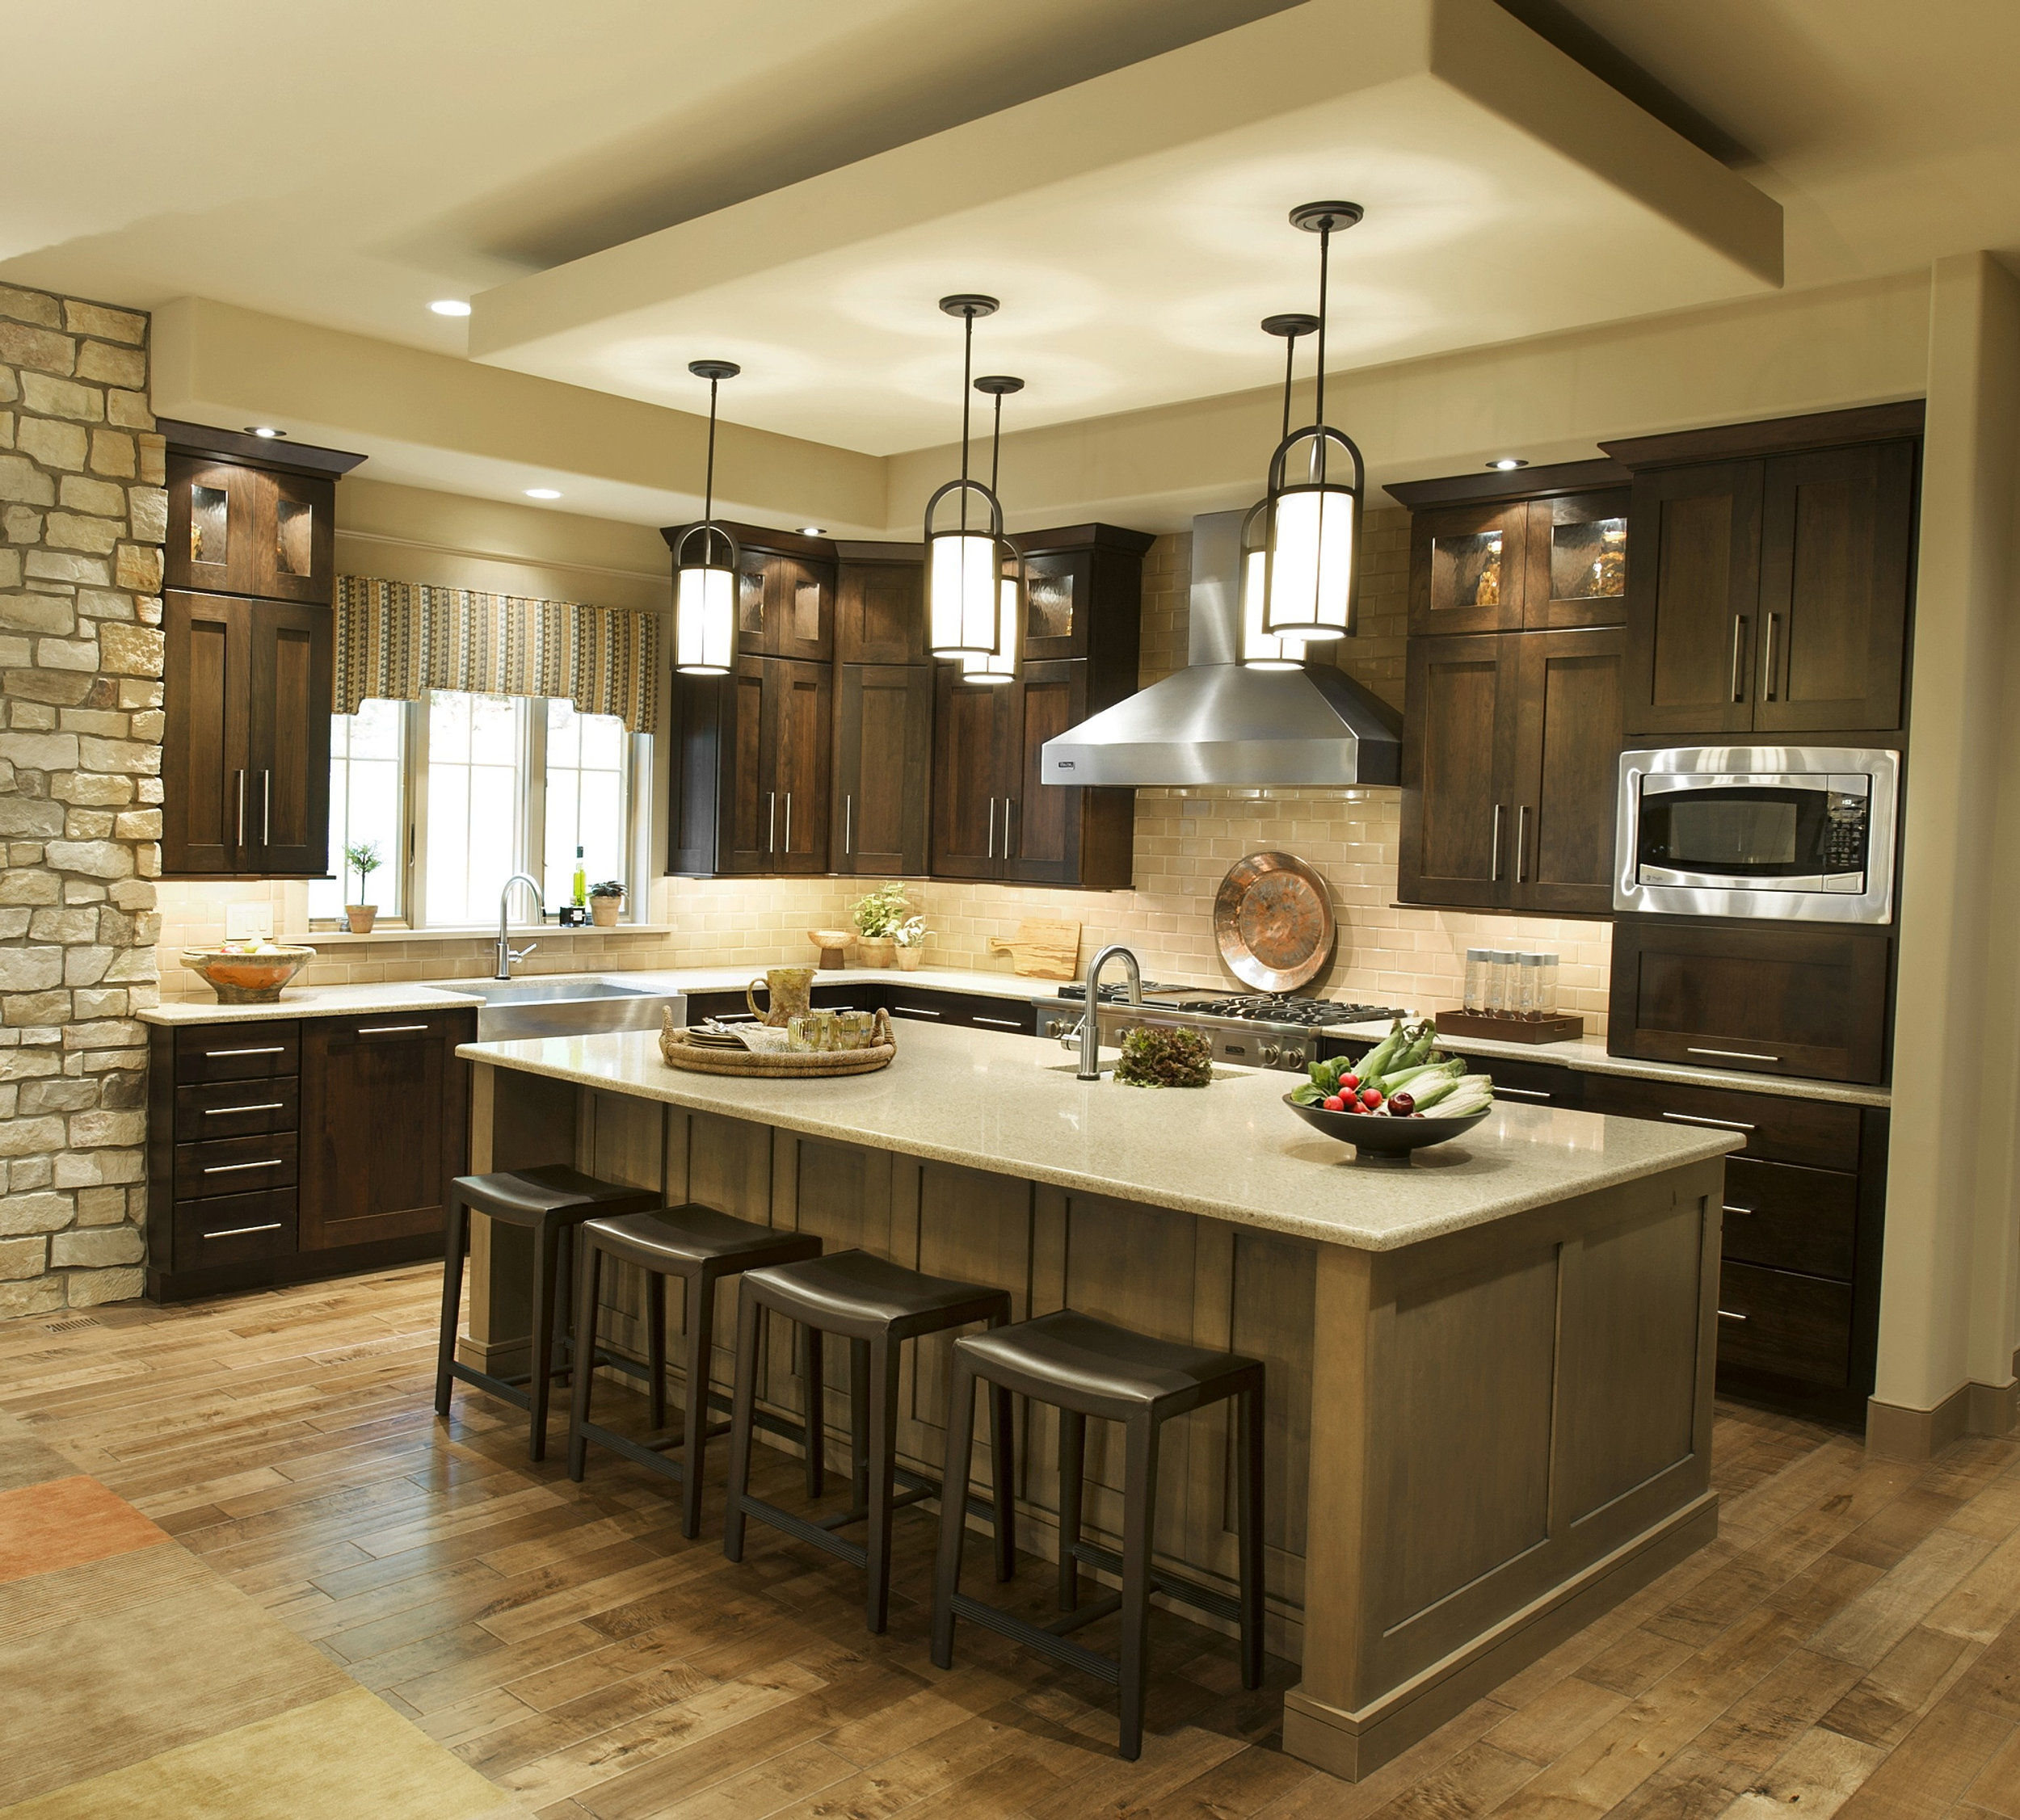 Panza enterprises ct home of designer - Cochrane Floors Cabinetry Design